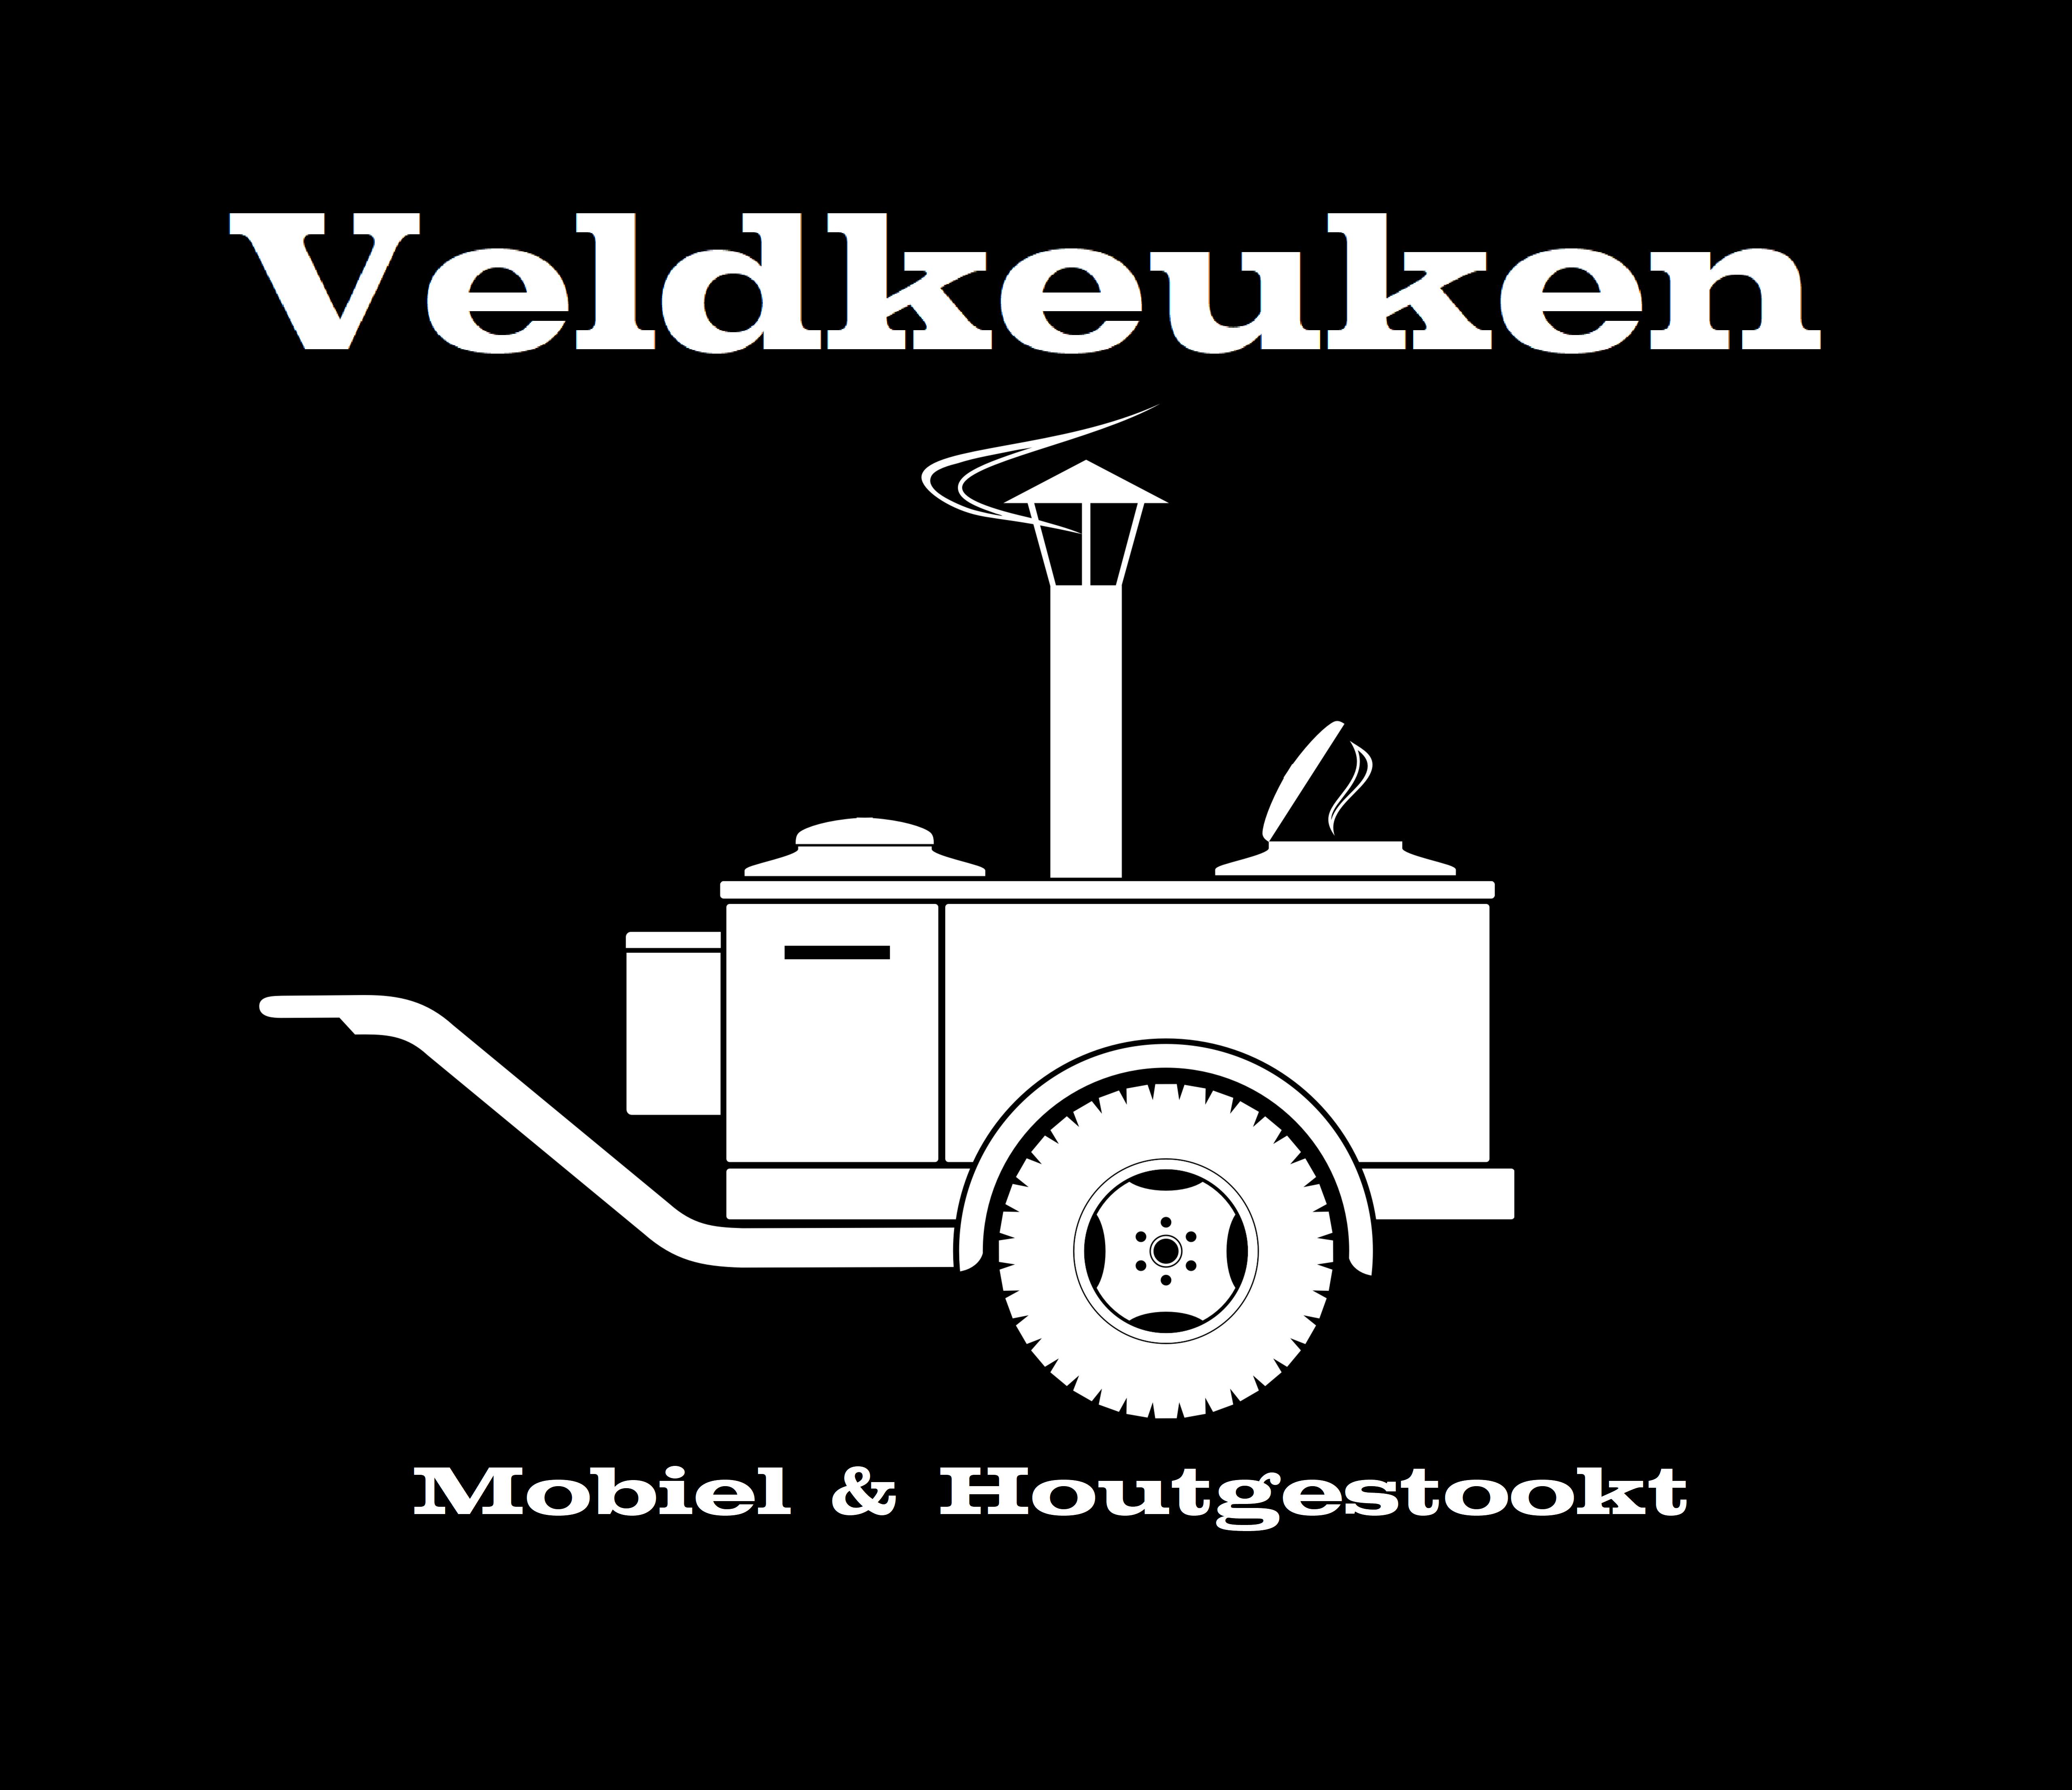 Mobiele Veldkeuken Logo